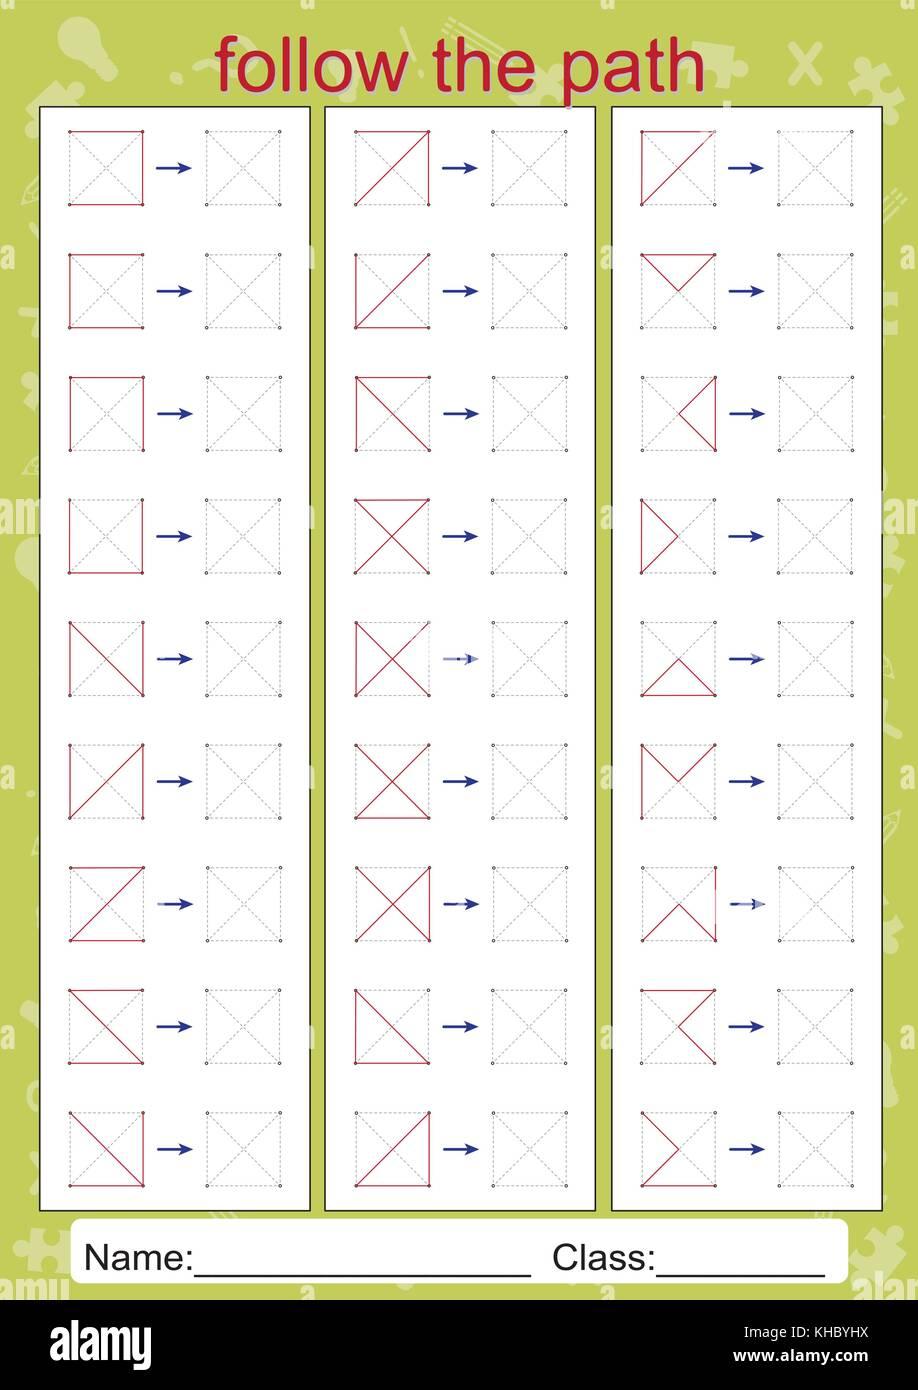 Worksheets Visual Perceptual Worksheets visual perceptual worksheets follow the path copy pattern stock pattern